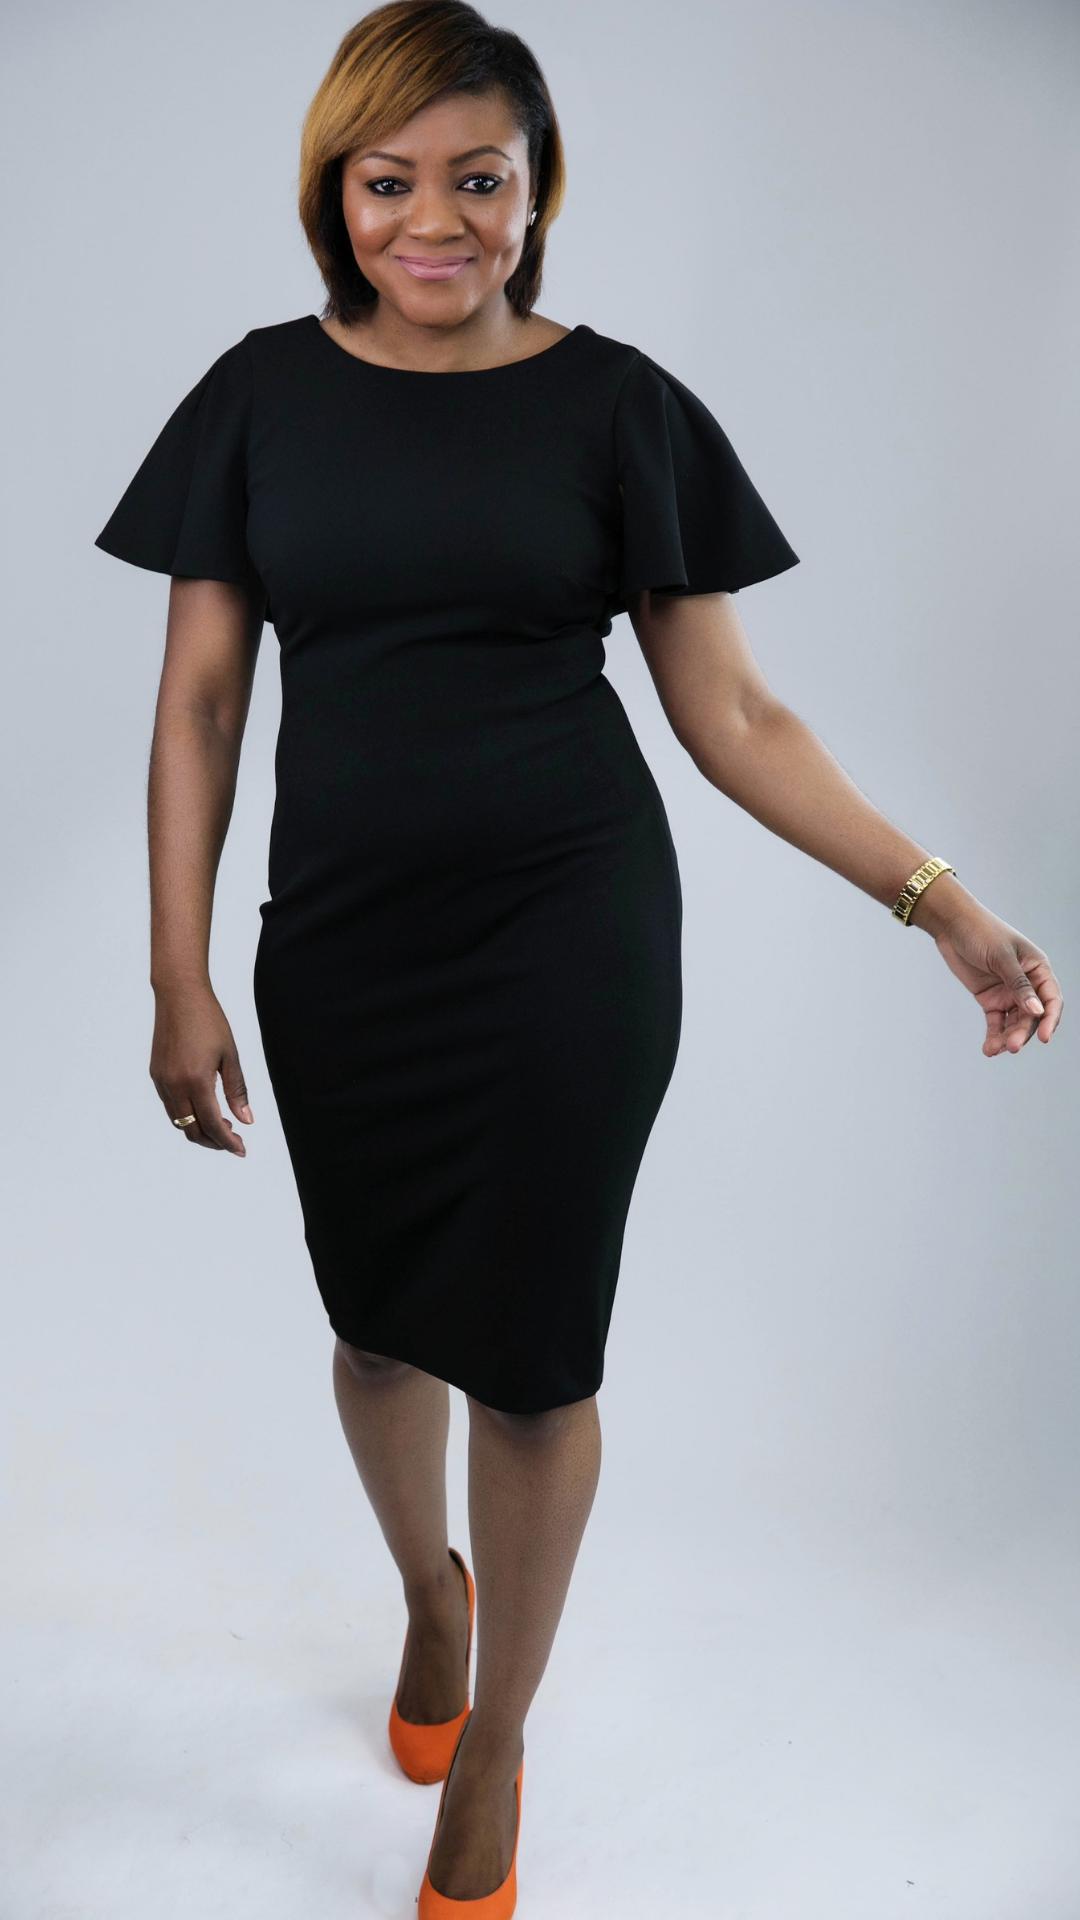 jamara-wilson-owner-tuxedo-impressions-progressive-cleaning